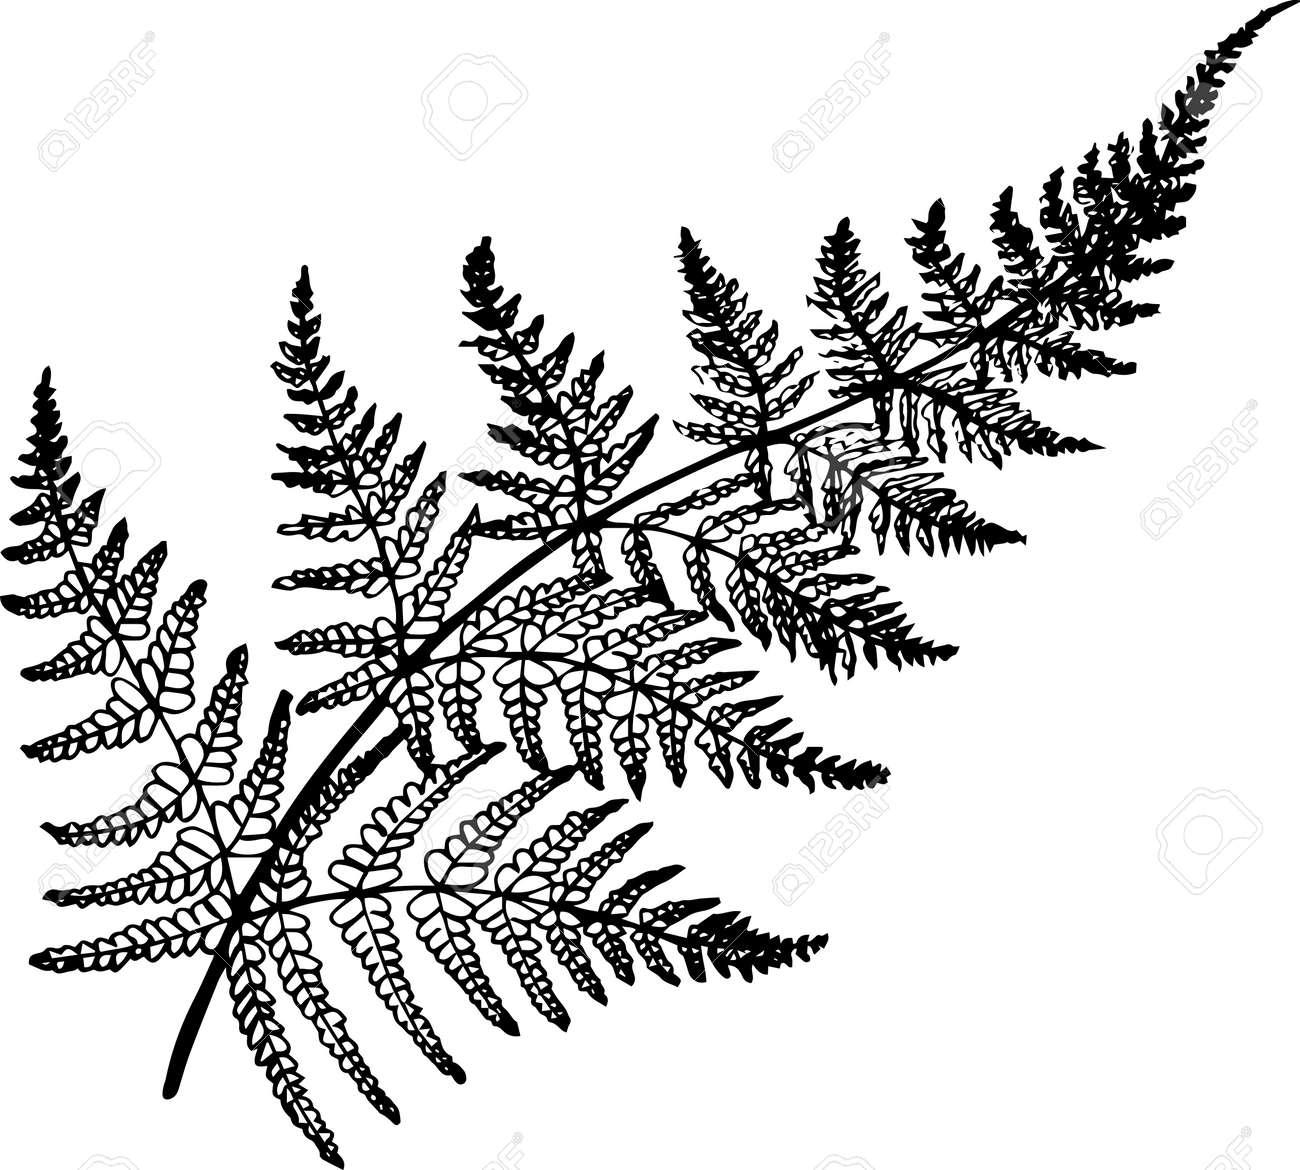 Black and white fern illustration. Ancient plant. - 77704018